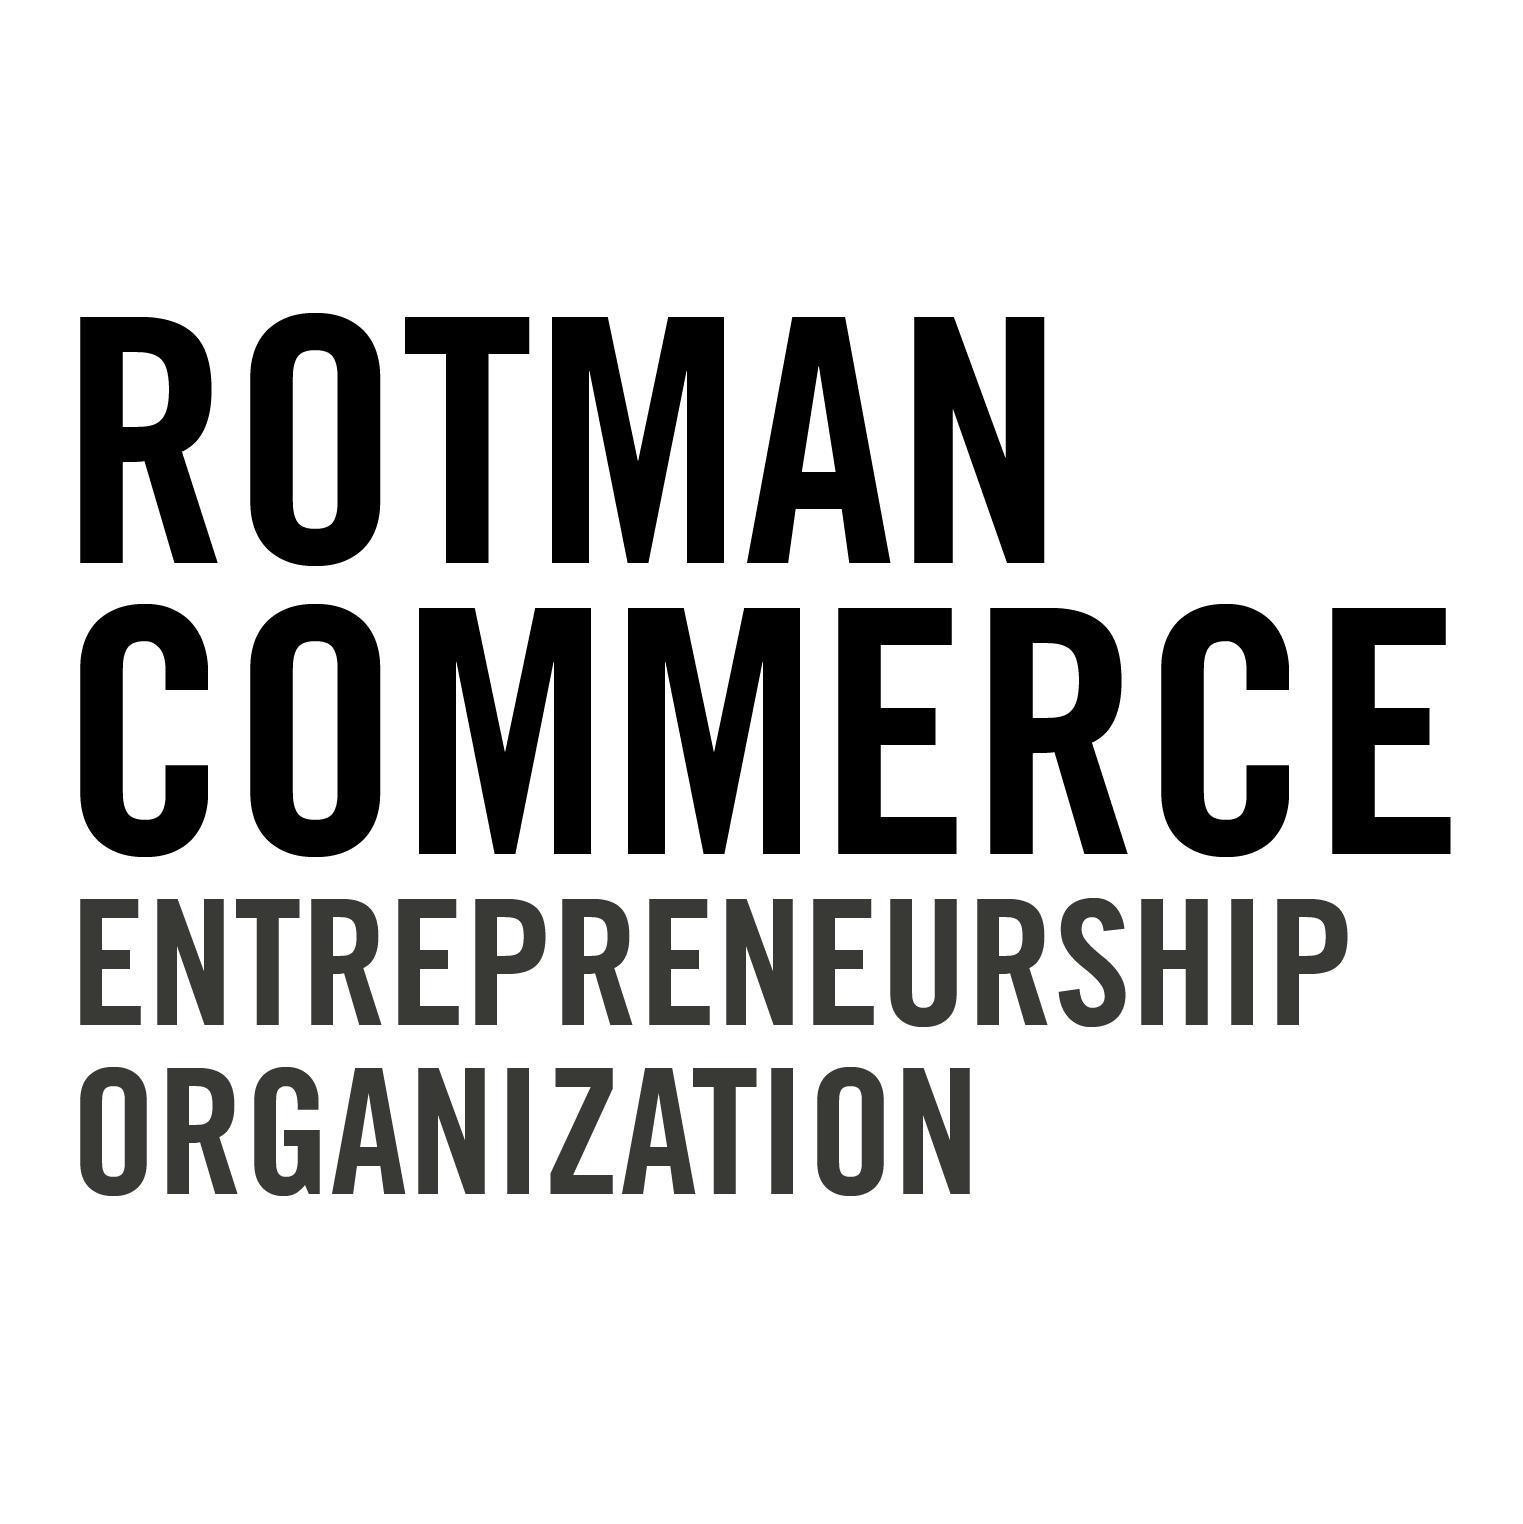 ROTMAN COMMERCE ENTREPRENEURSHIP ORGANIZATION